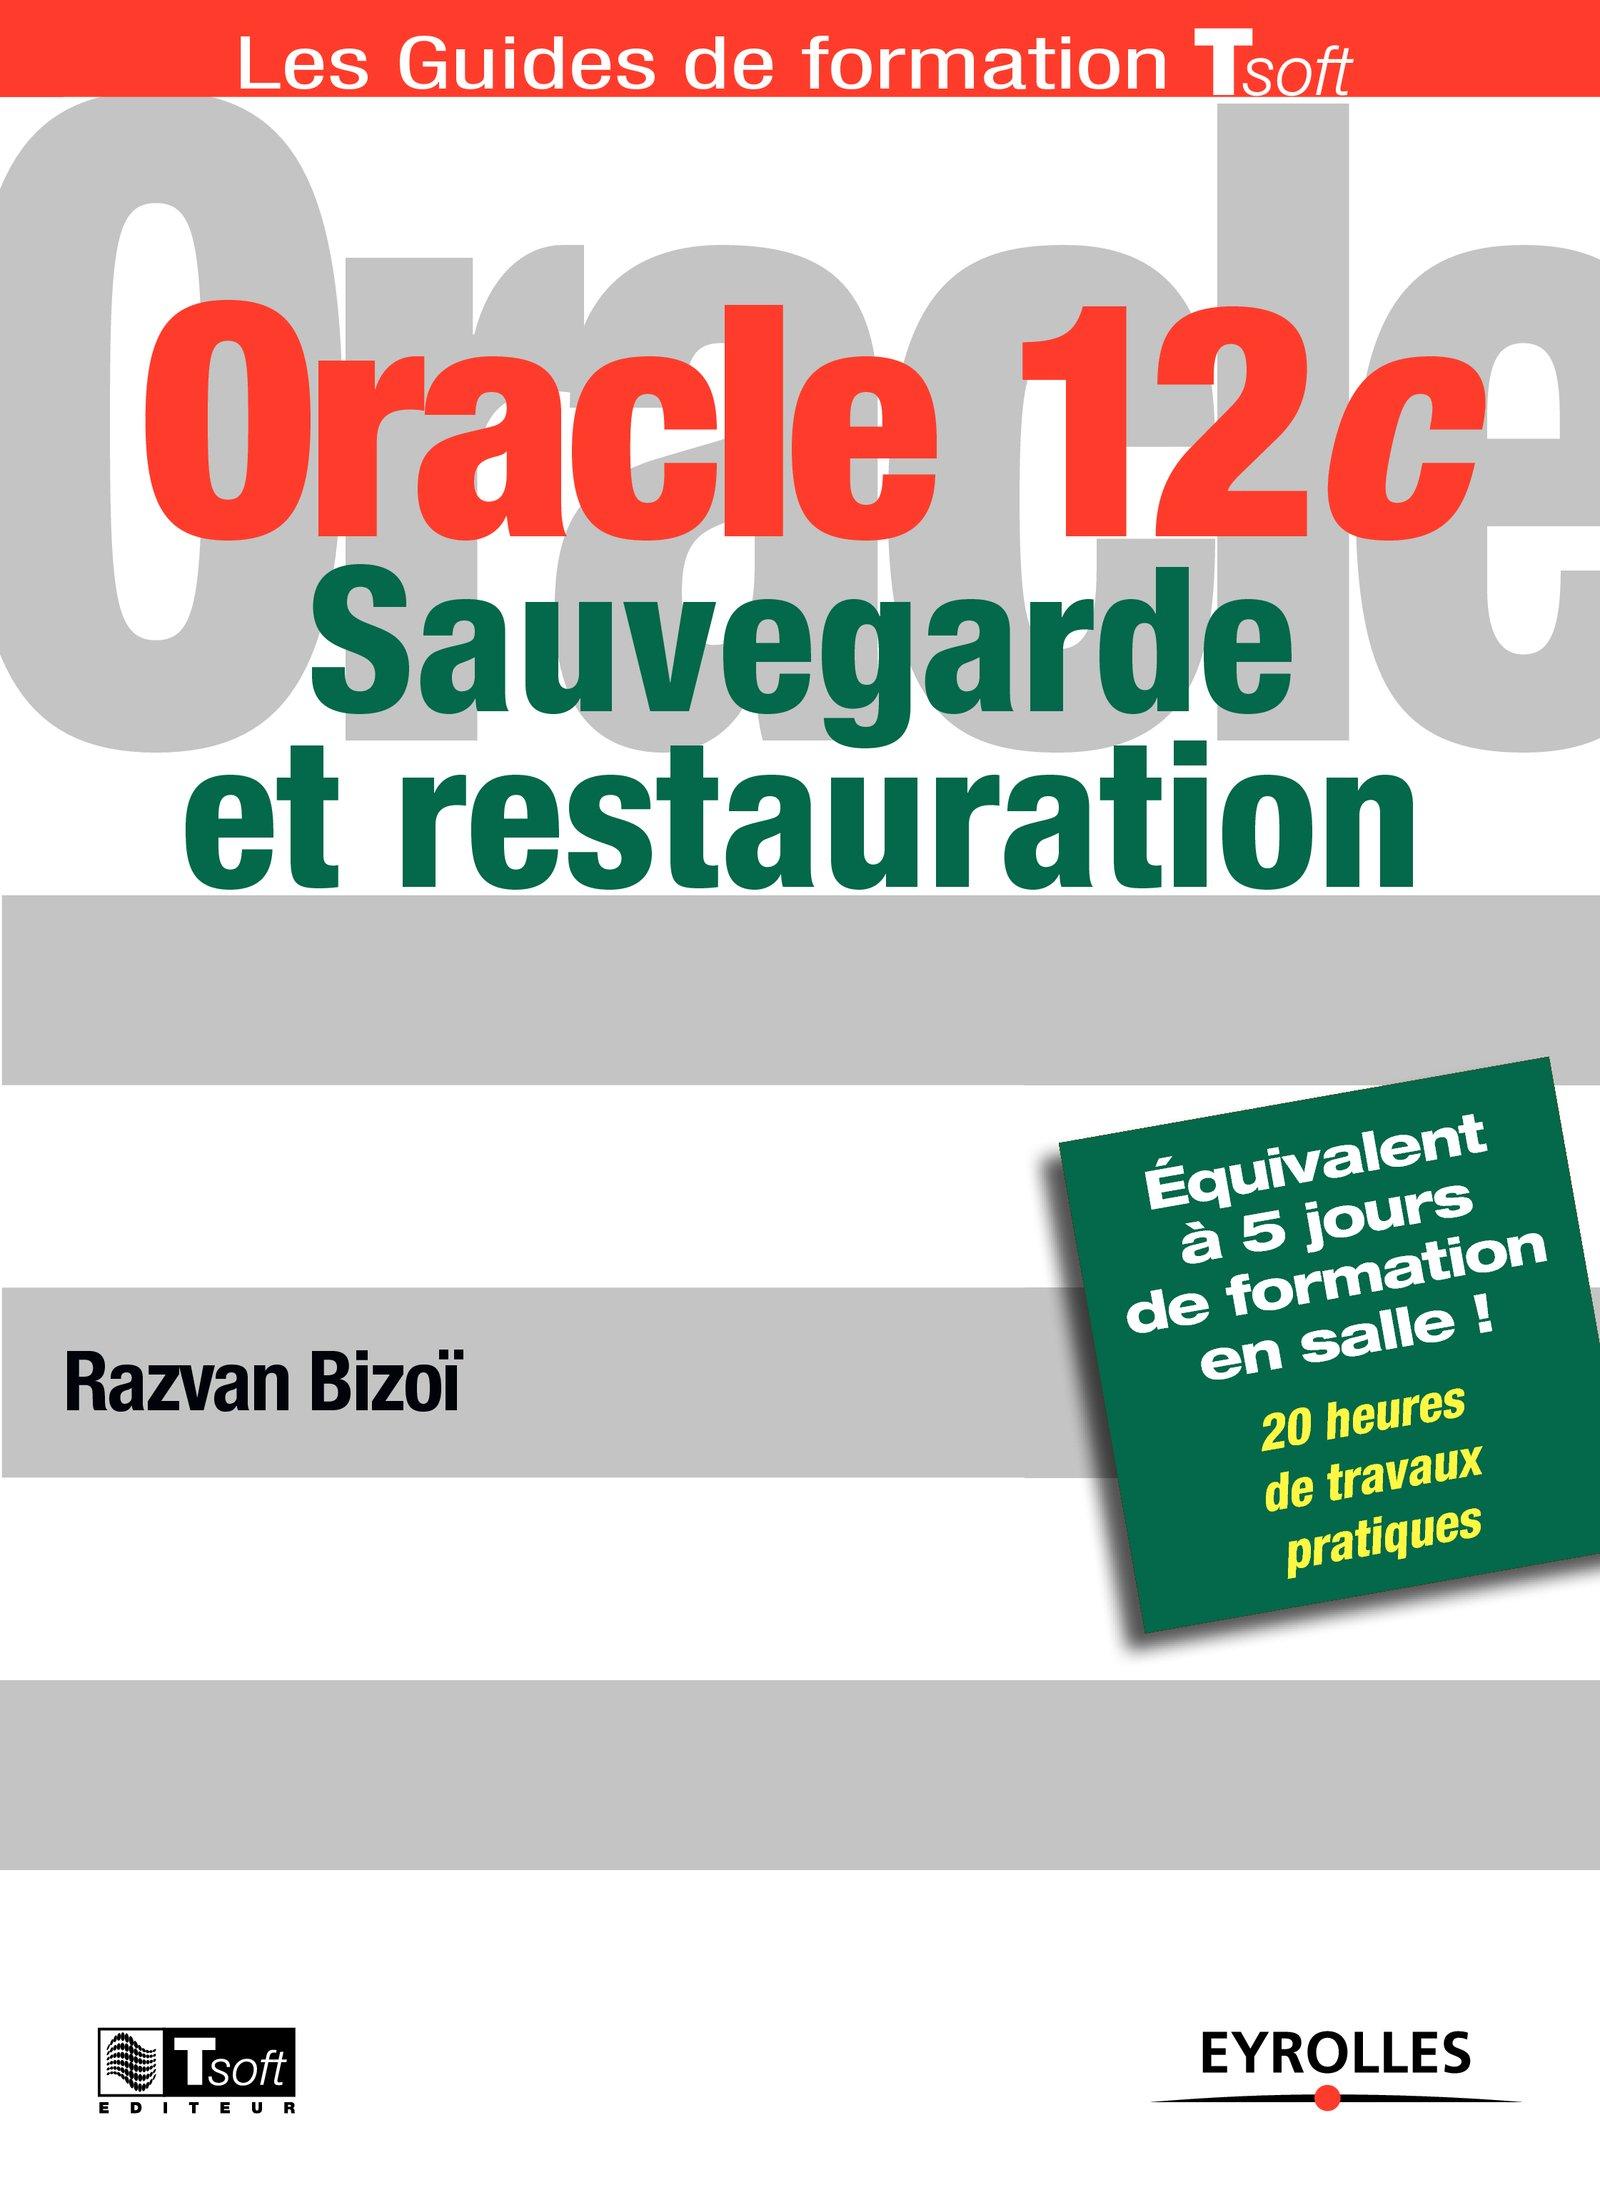 Oracle 12c - Sauvegarde et restauration Broché – 2 octobre 2014 Razvan Bizoï Eyrolles 2212140576 Informatique